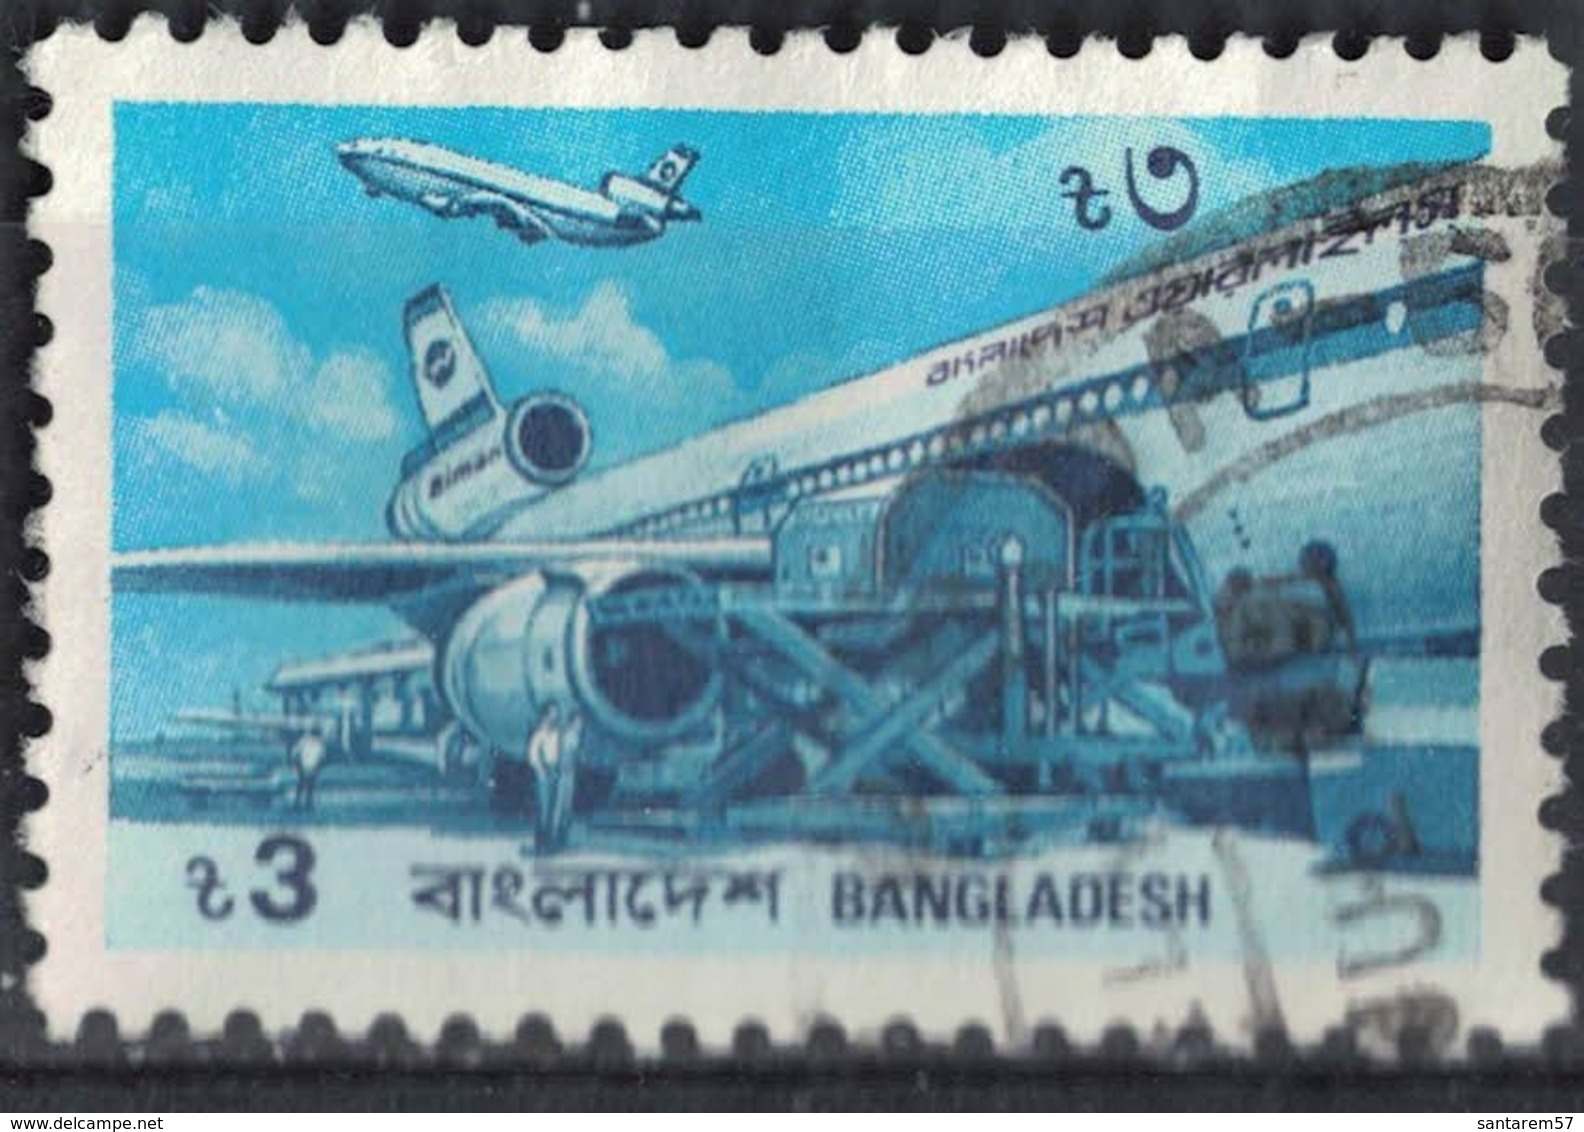 Bangladesh 1989 Oblitéré Used Loading Aircraft Chargement Avion McDonnell Douglas - Bangladesch